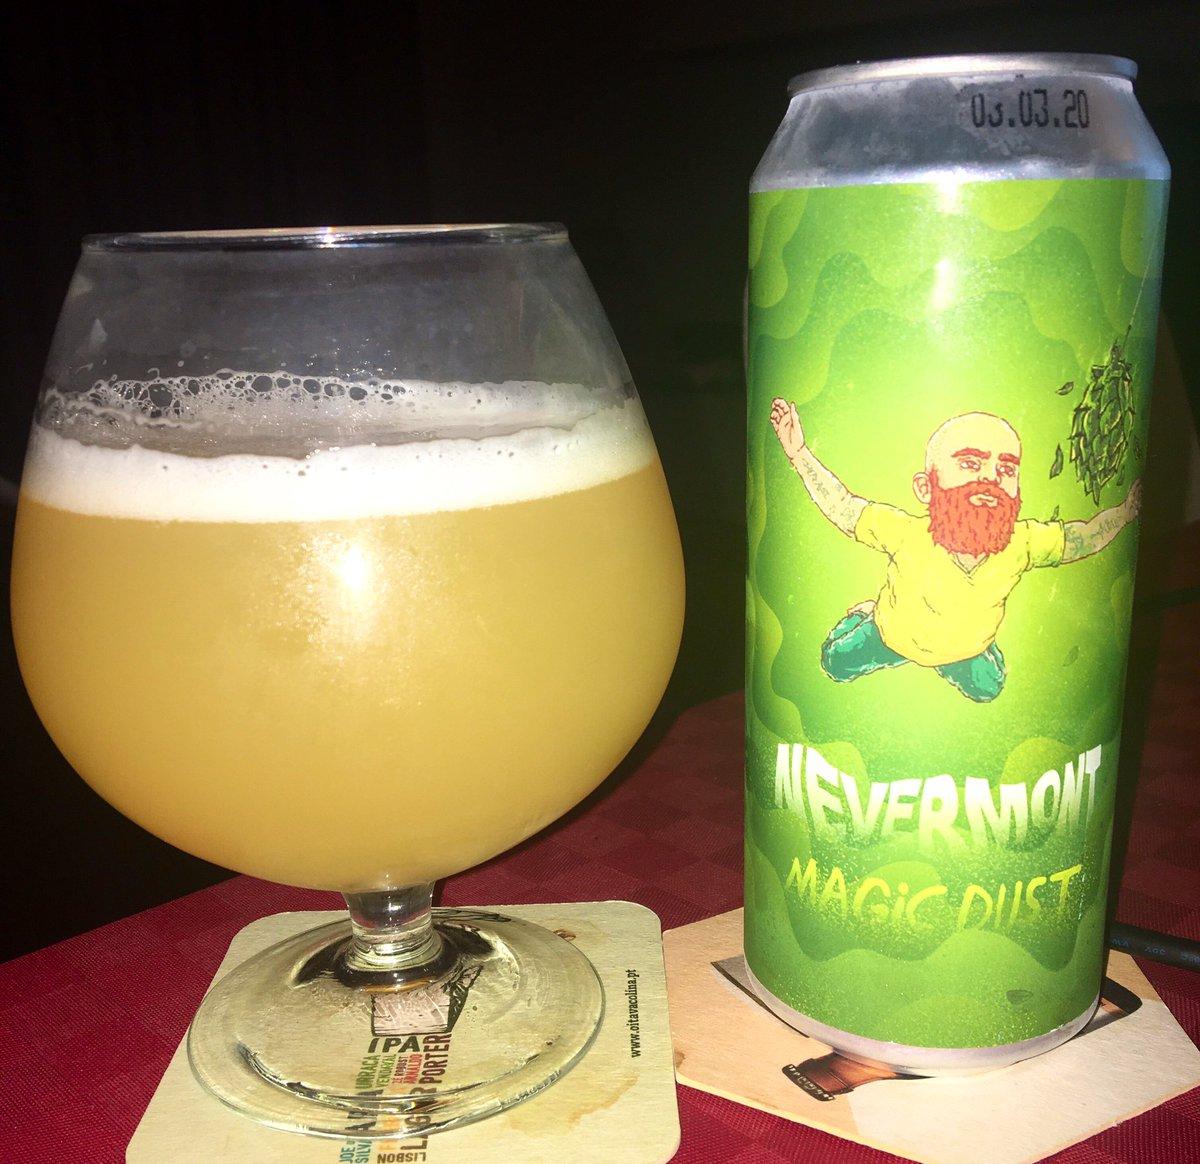 Nevermont Magic Dust Stamm Brewing (Rússia ) New England IPA; 7% ABV; 50 IBU #CraftBeer #cervejaartesanal pic.twitter.com/JoCRVR7KTe